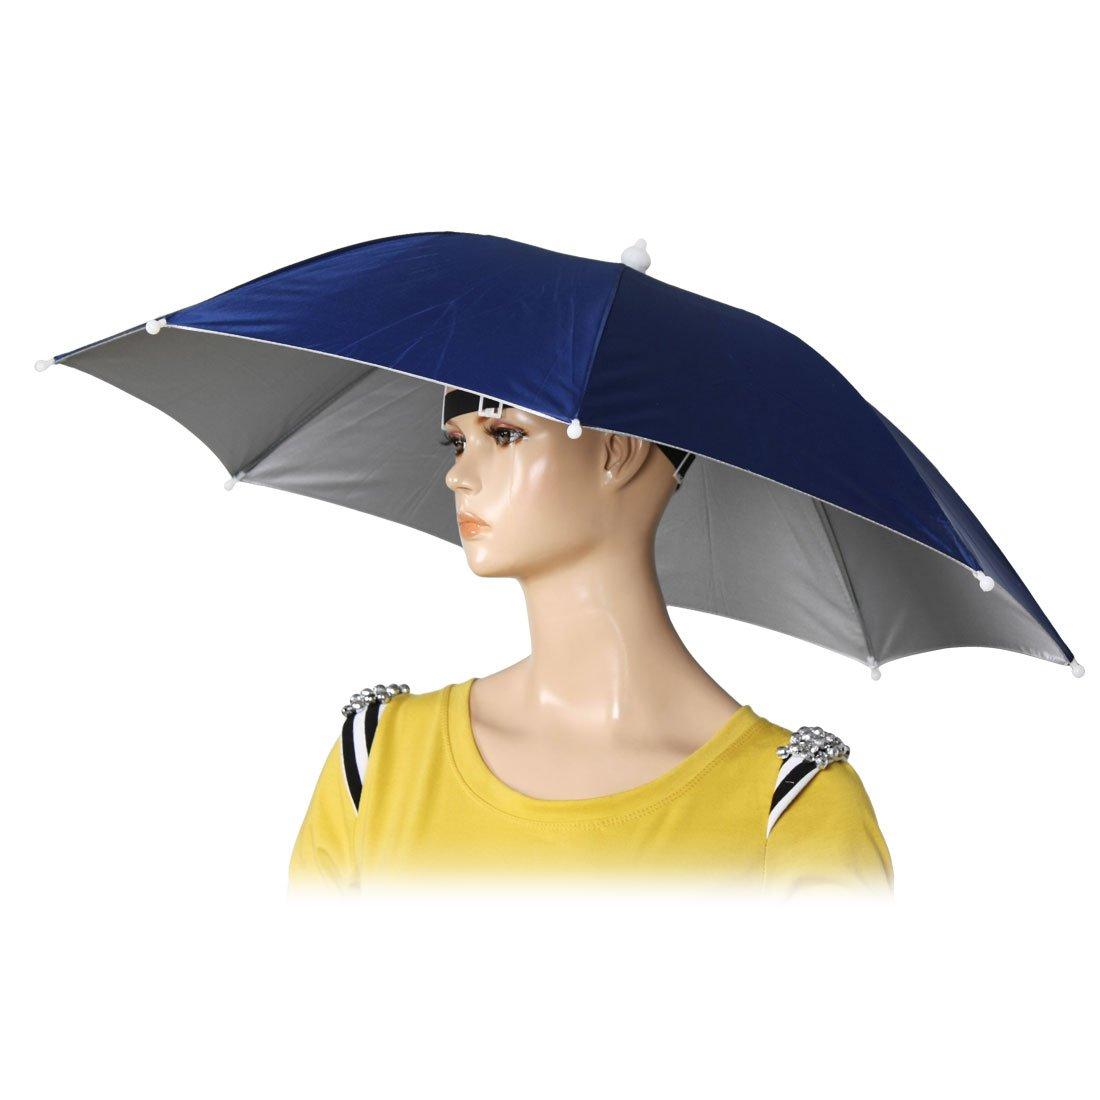 New Hotsale Promotion Como 29 5 Diameter Elastic Band Fishing Headwear Umbrella Hat Dark Blue